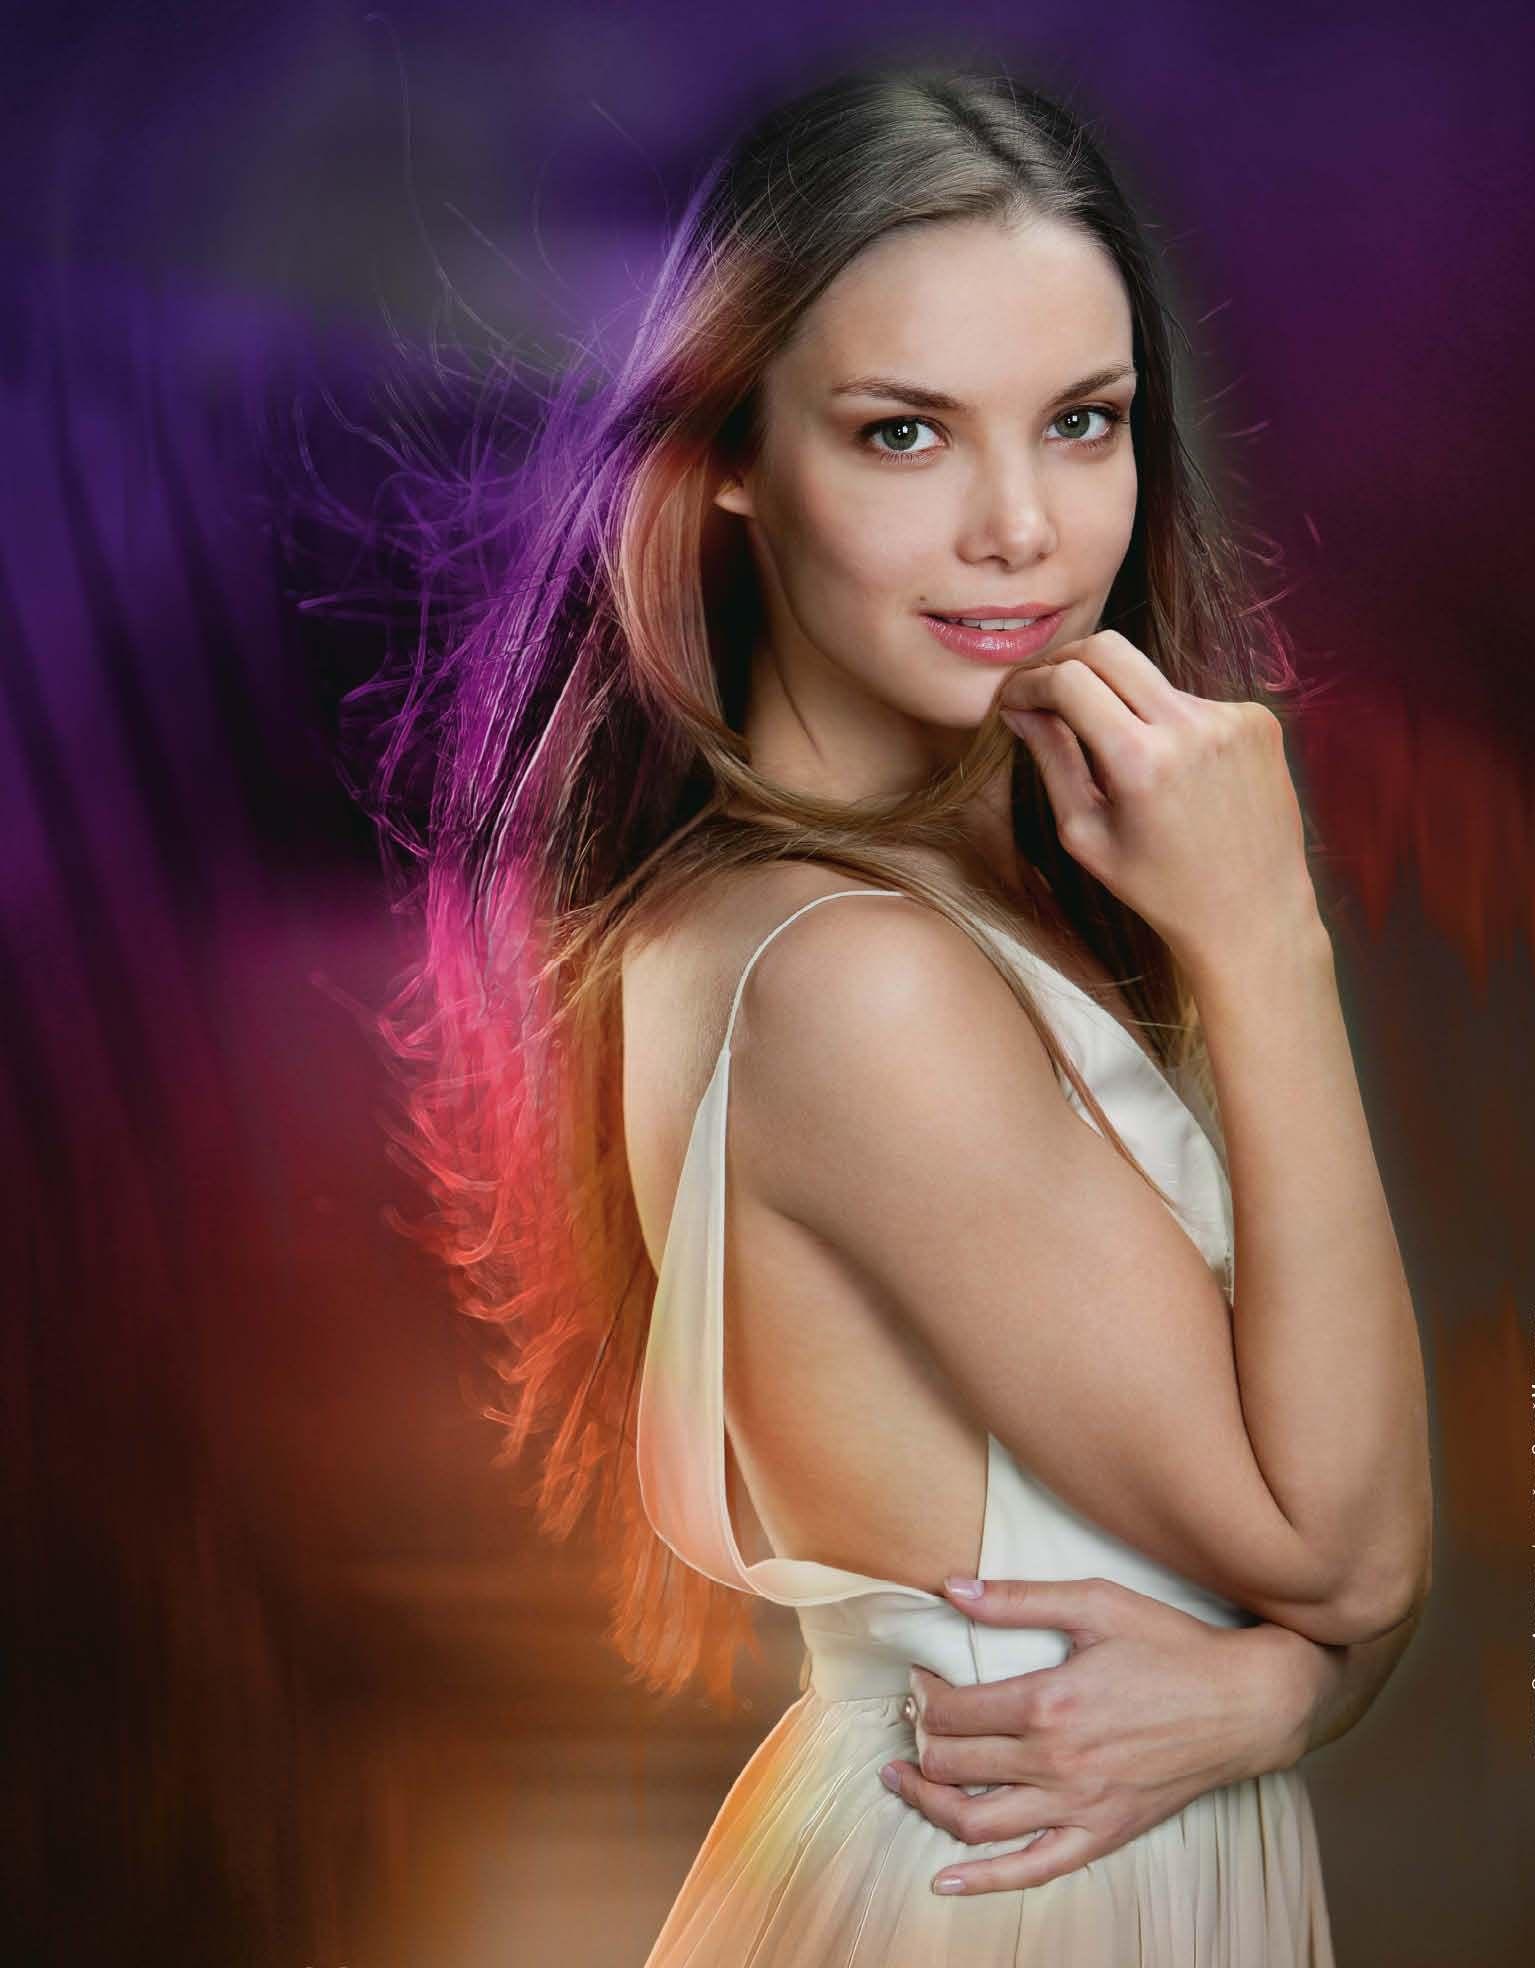 Актриса ольга арнтгольц младше своей